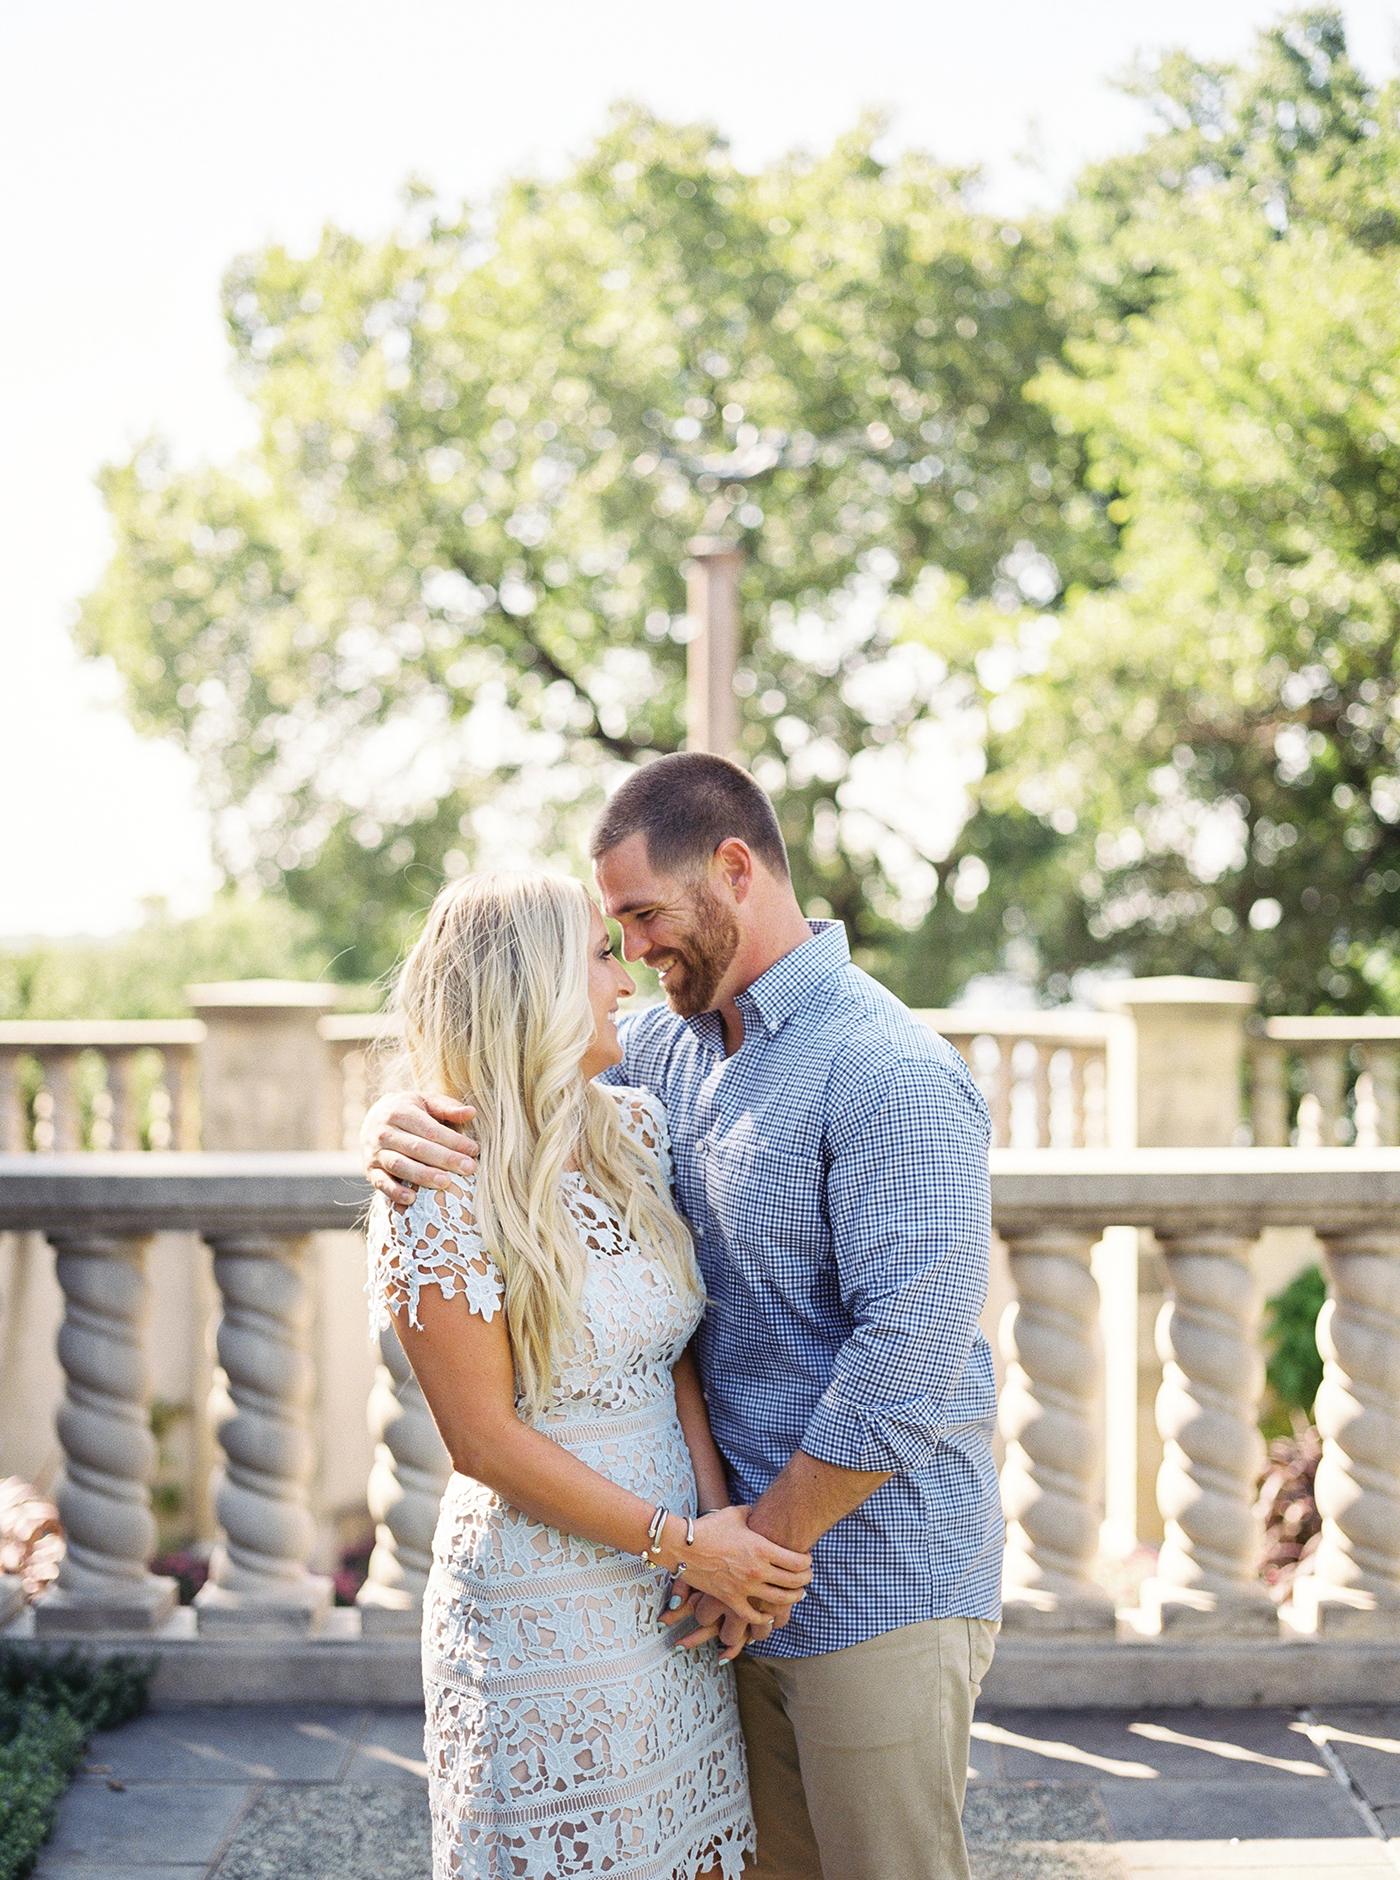 DFW Wedding Plannning | Allday Events | Dallas Arboretum Engagement Session | 00030.jpg